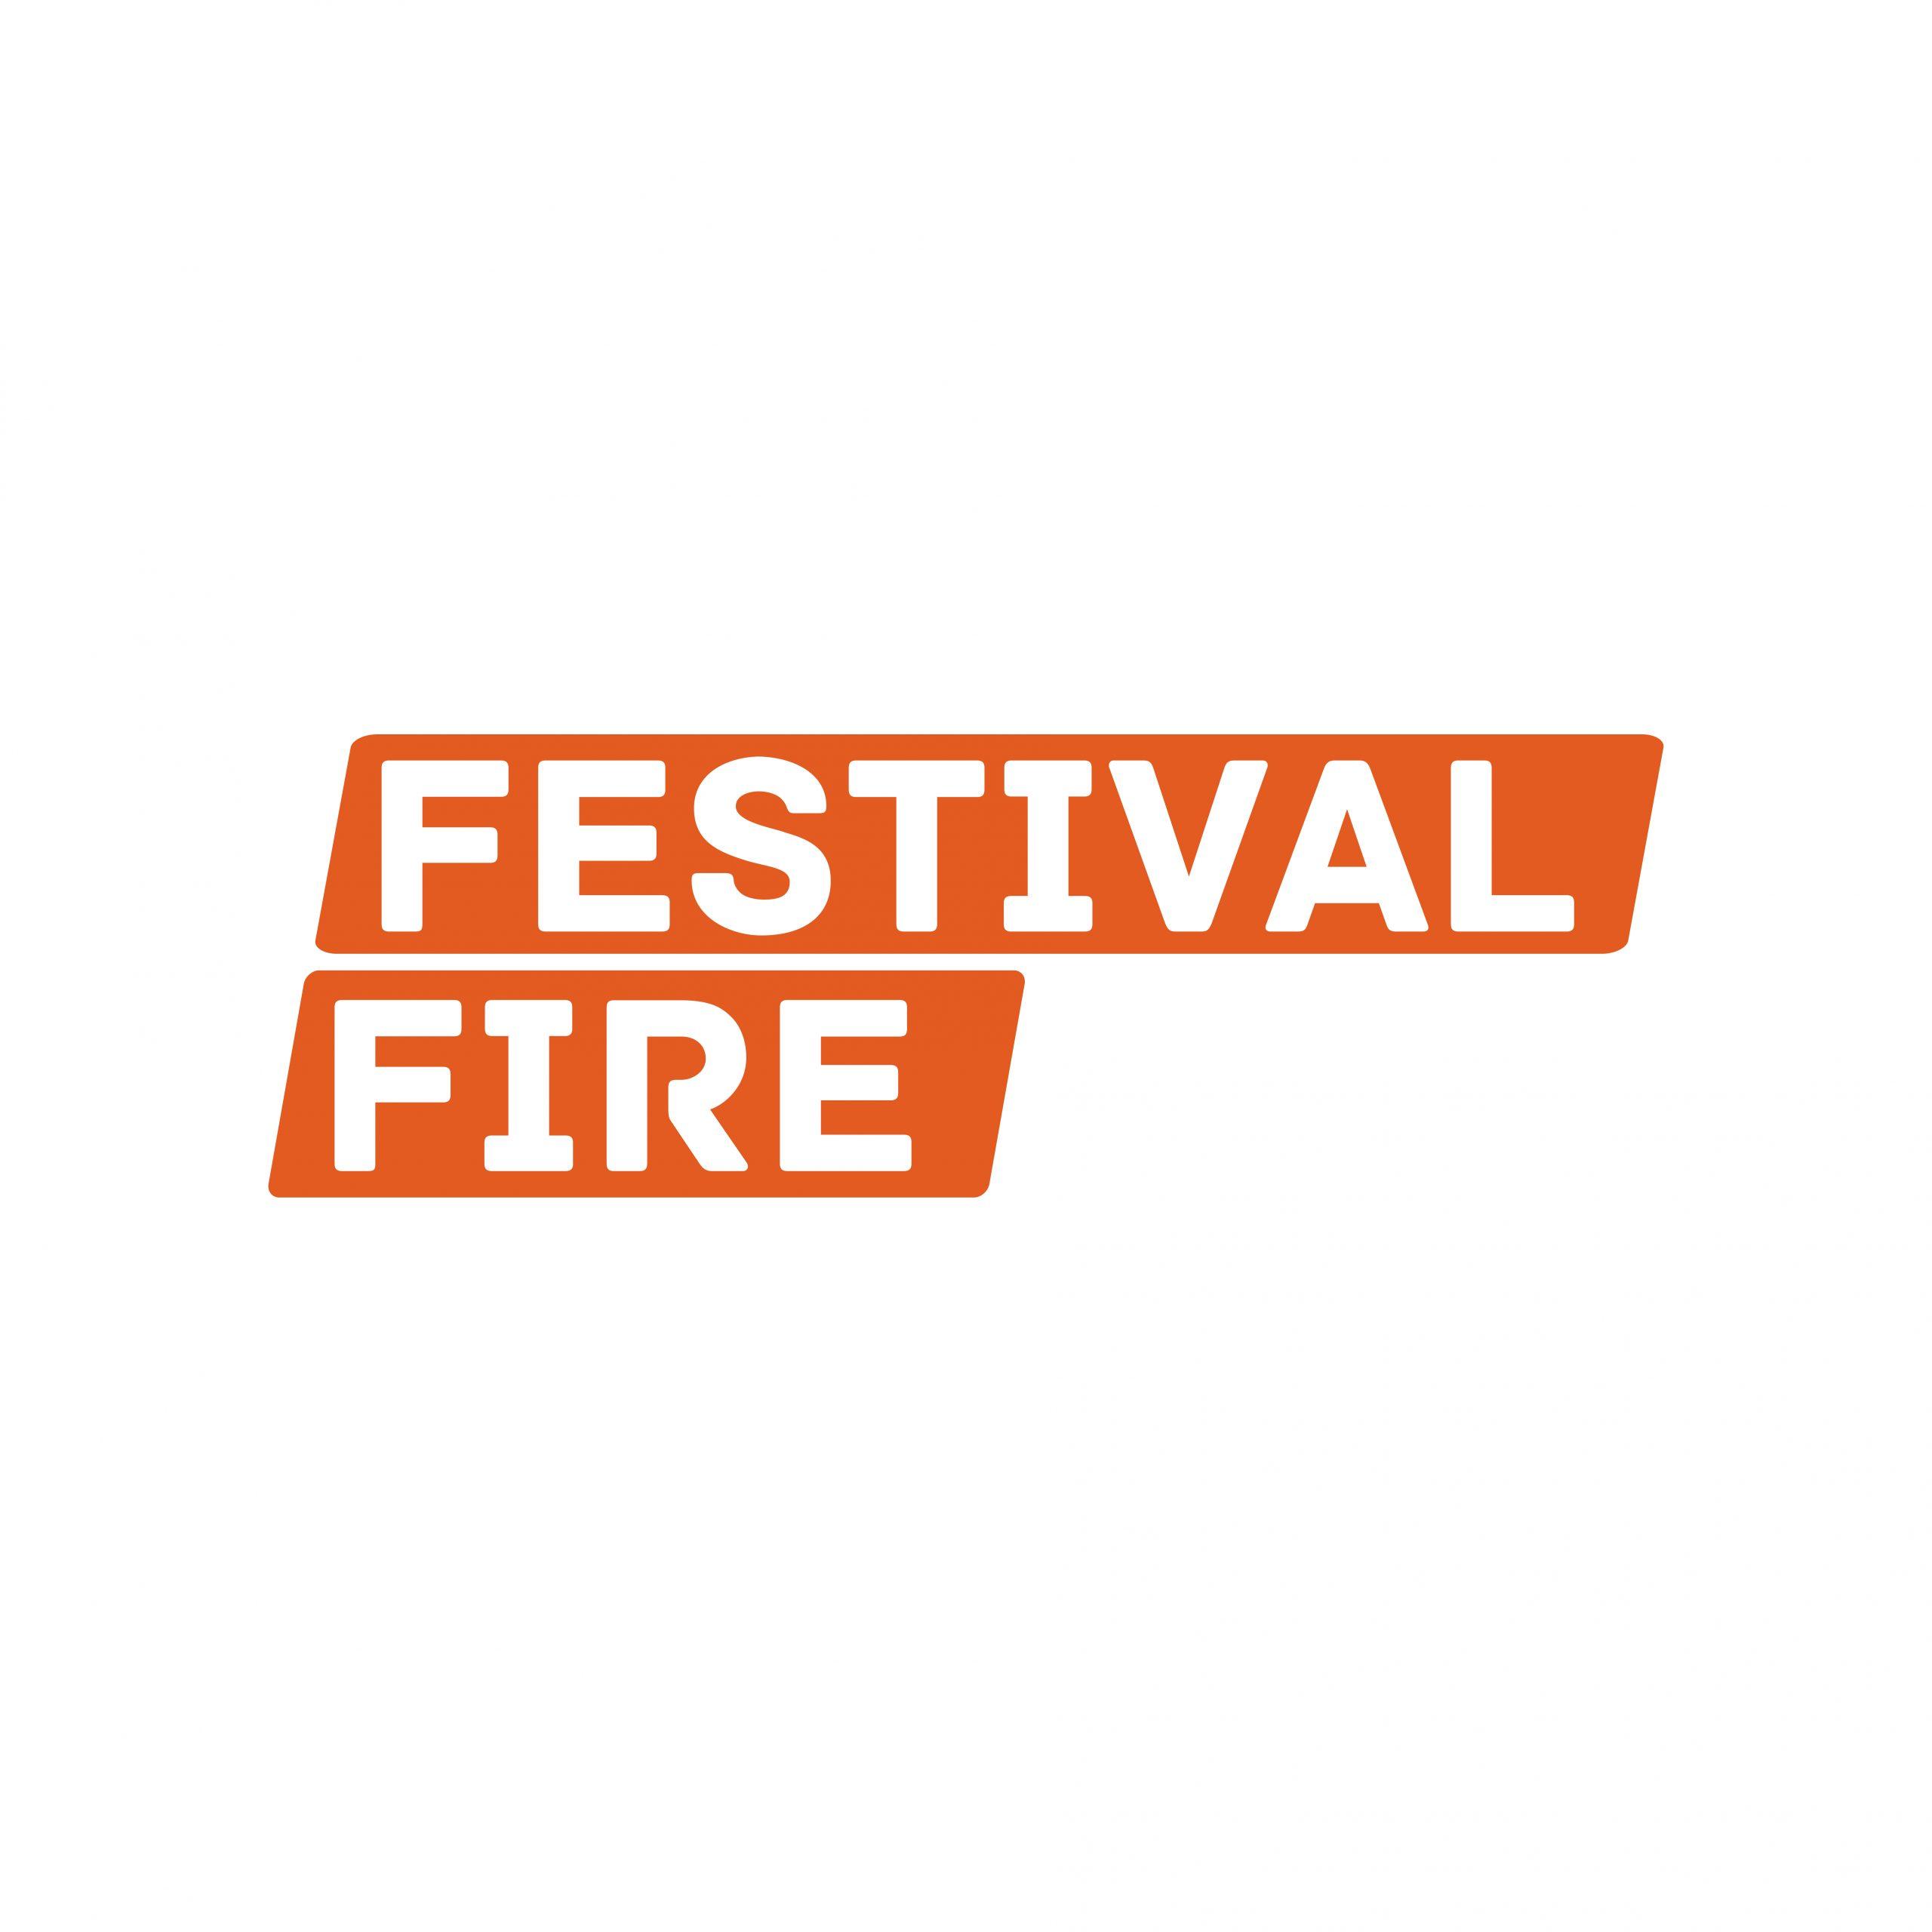 Festivalfire